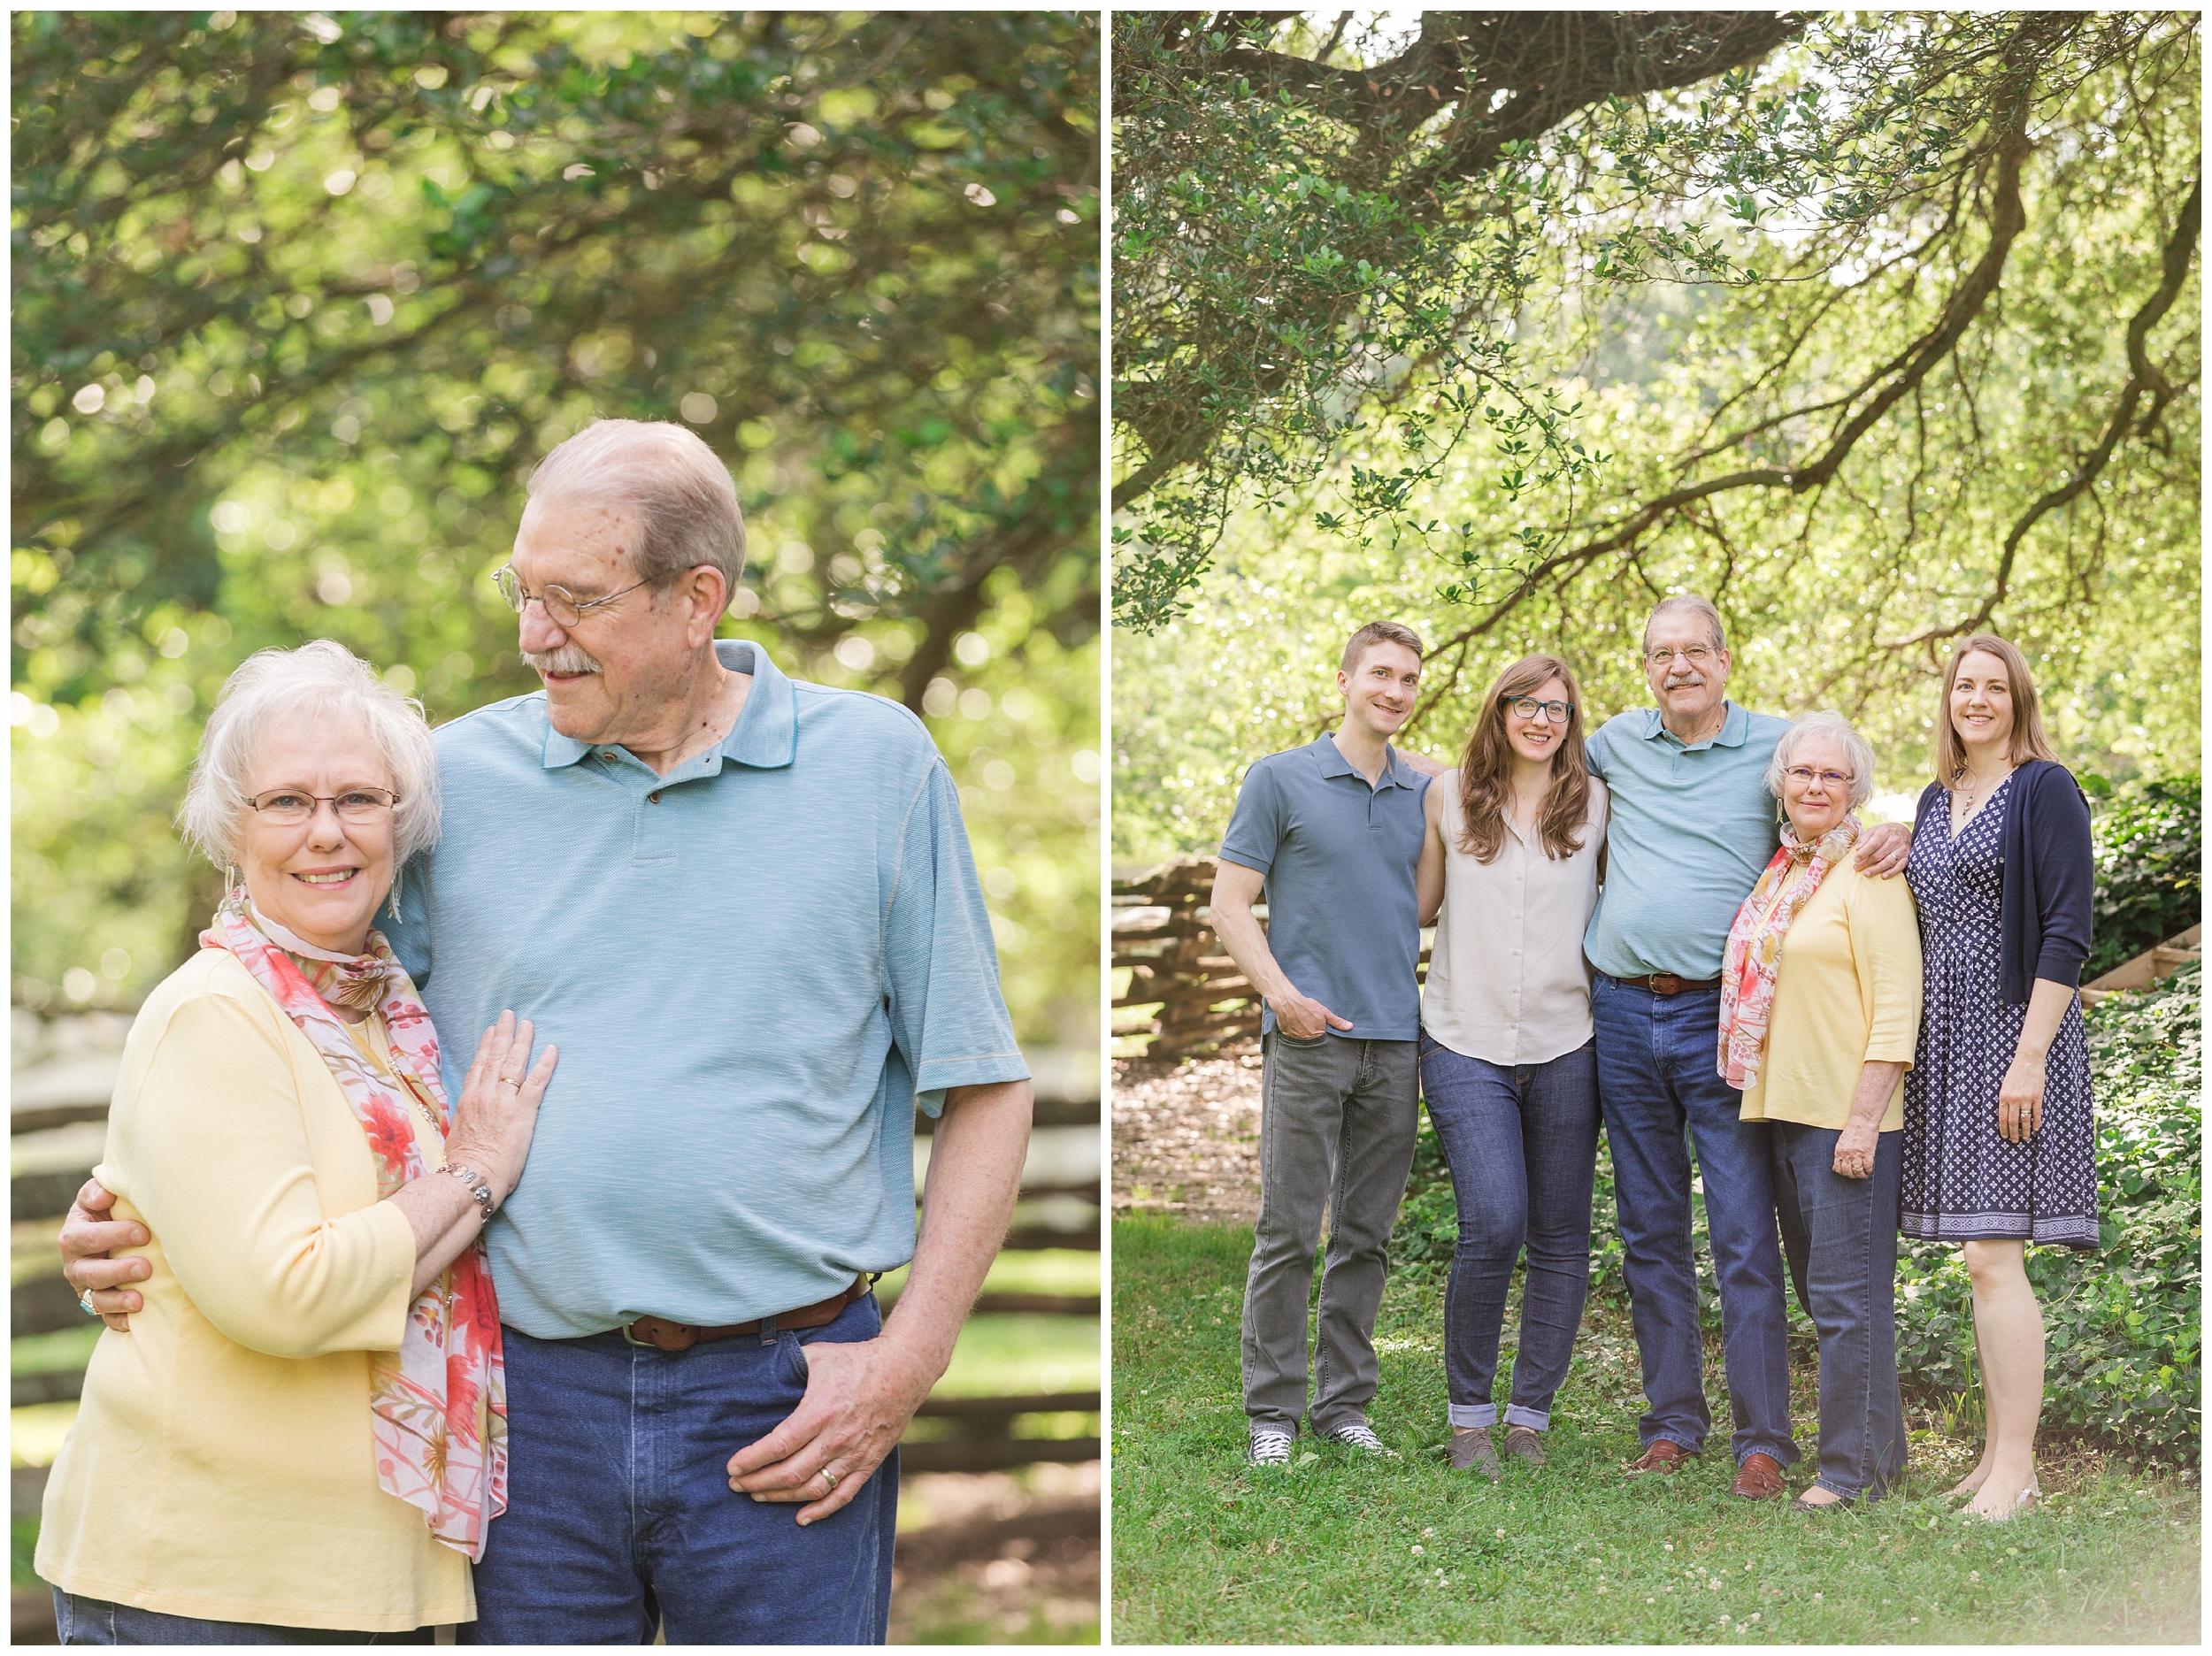 williamsburg family photography by elovephotos_0006.jpg